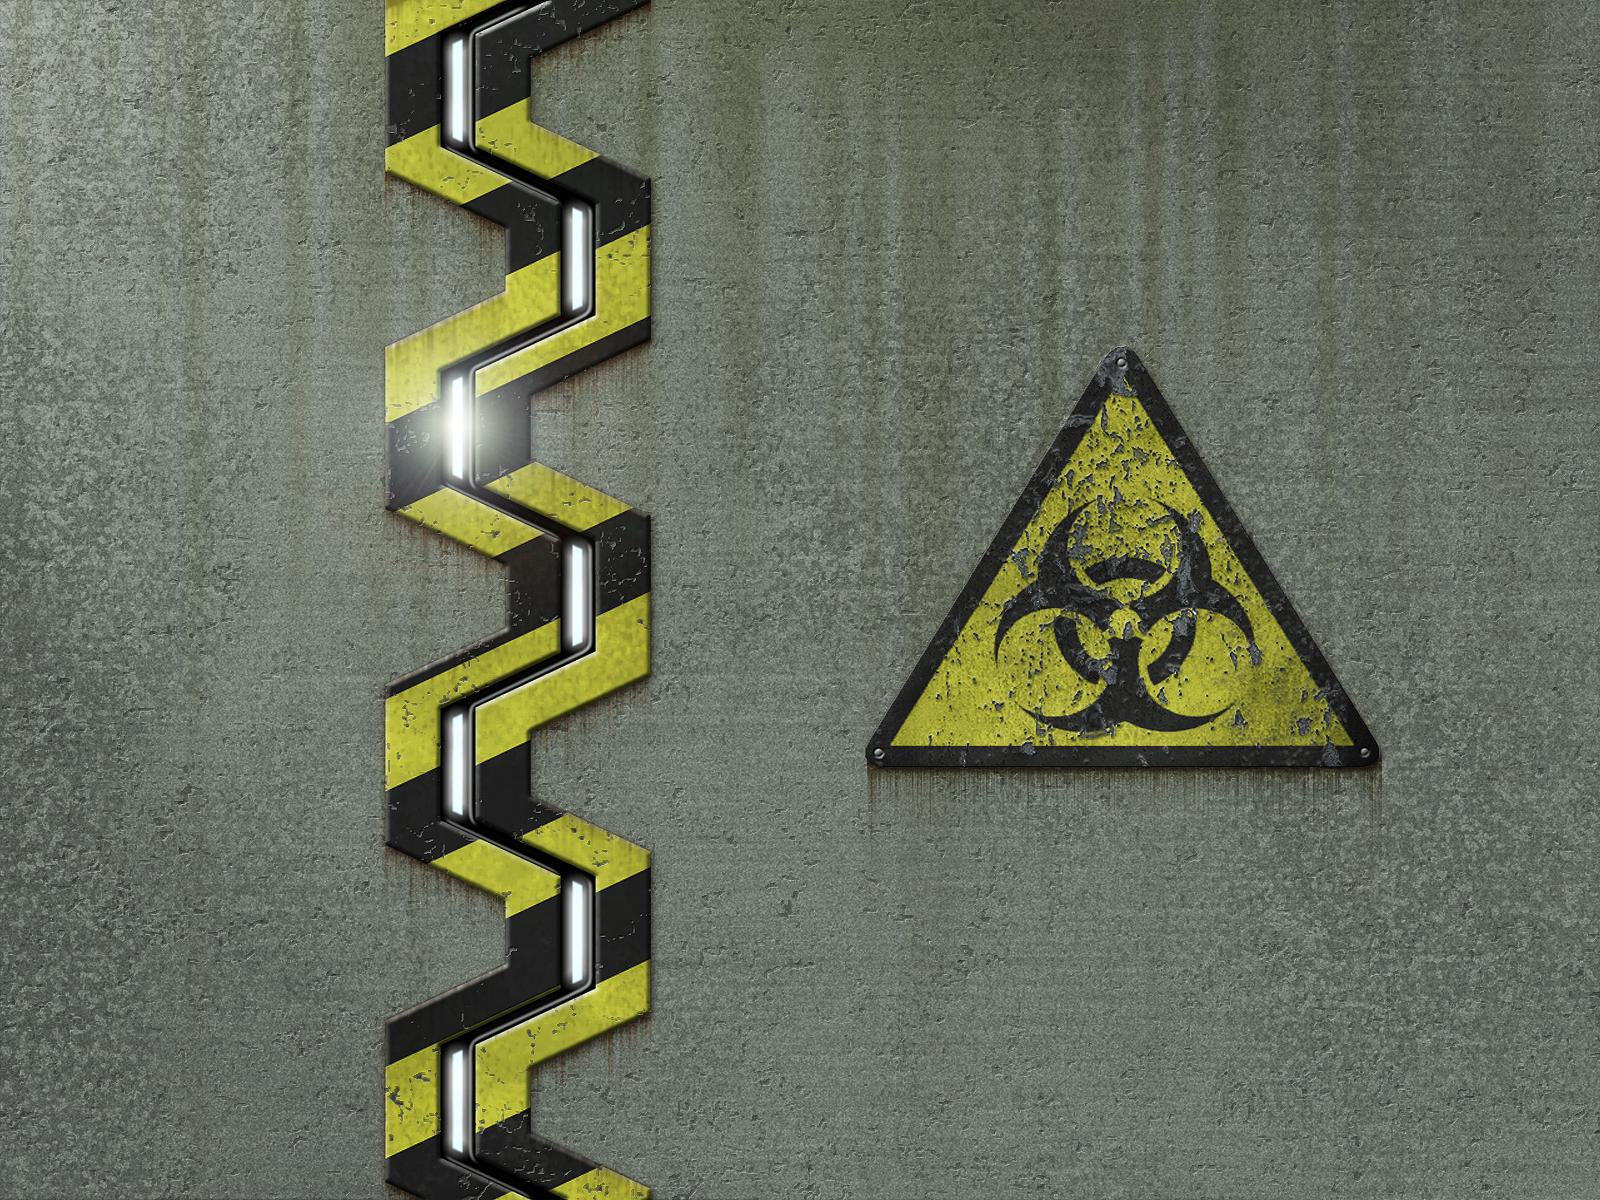 http://1.bp.blogspot.com/-oWcck0bWSbI/TmDcUQhA0WI/AAAAAAAAC0U/hZvDvCfyWUU/s1600/Biohazard_Warning_Sign_HD_Wallpaper_www.Vvallpaper.Net_3.jpg